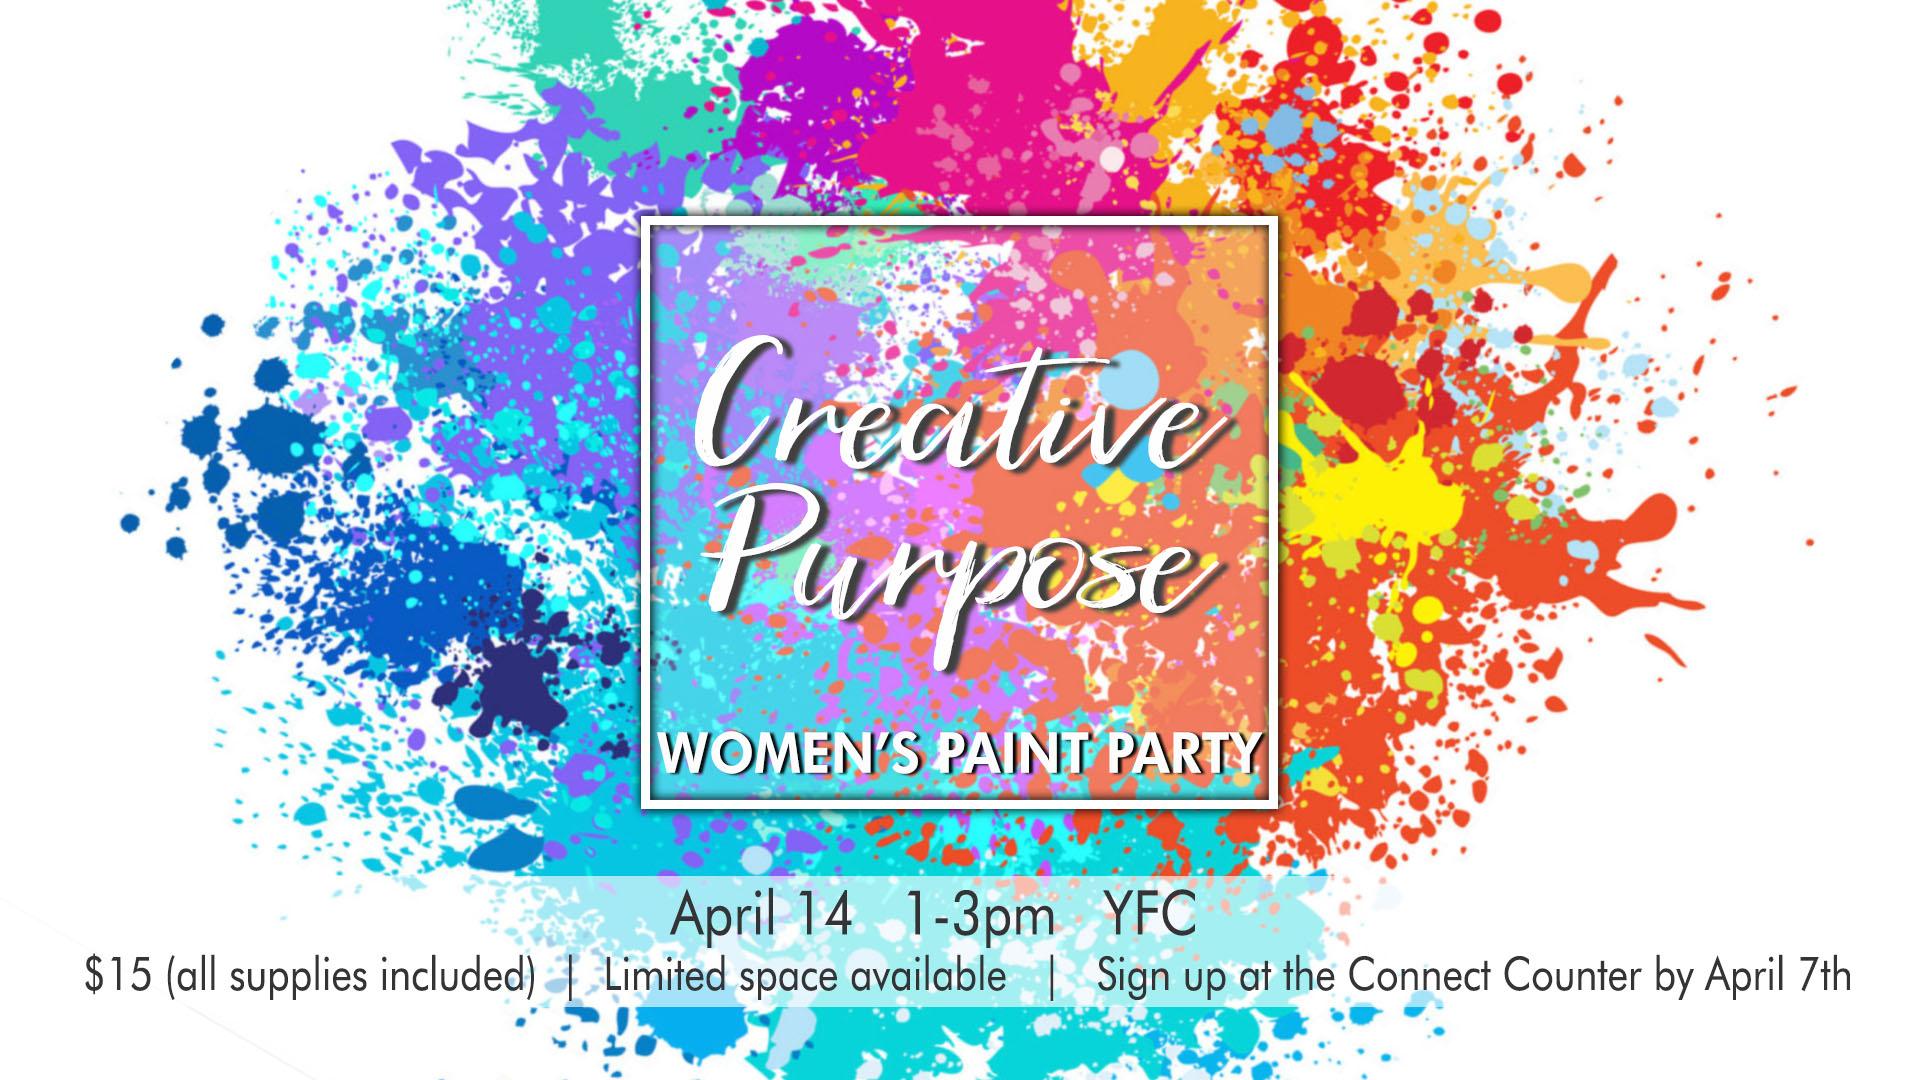 Creative Purpose 1920x1080 copy.jpg